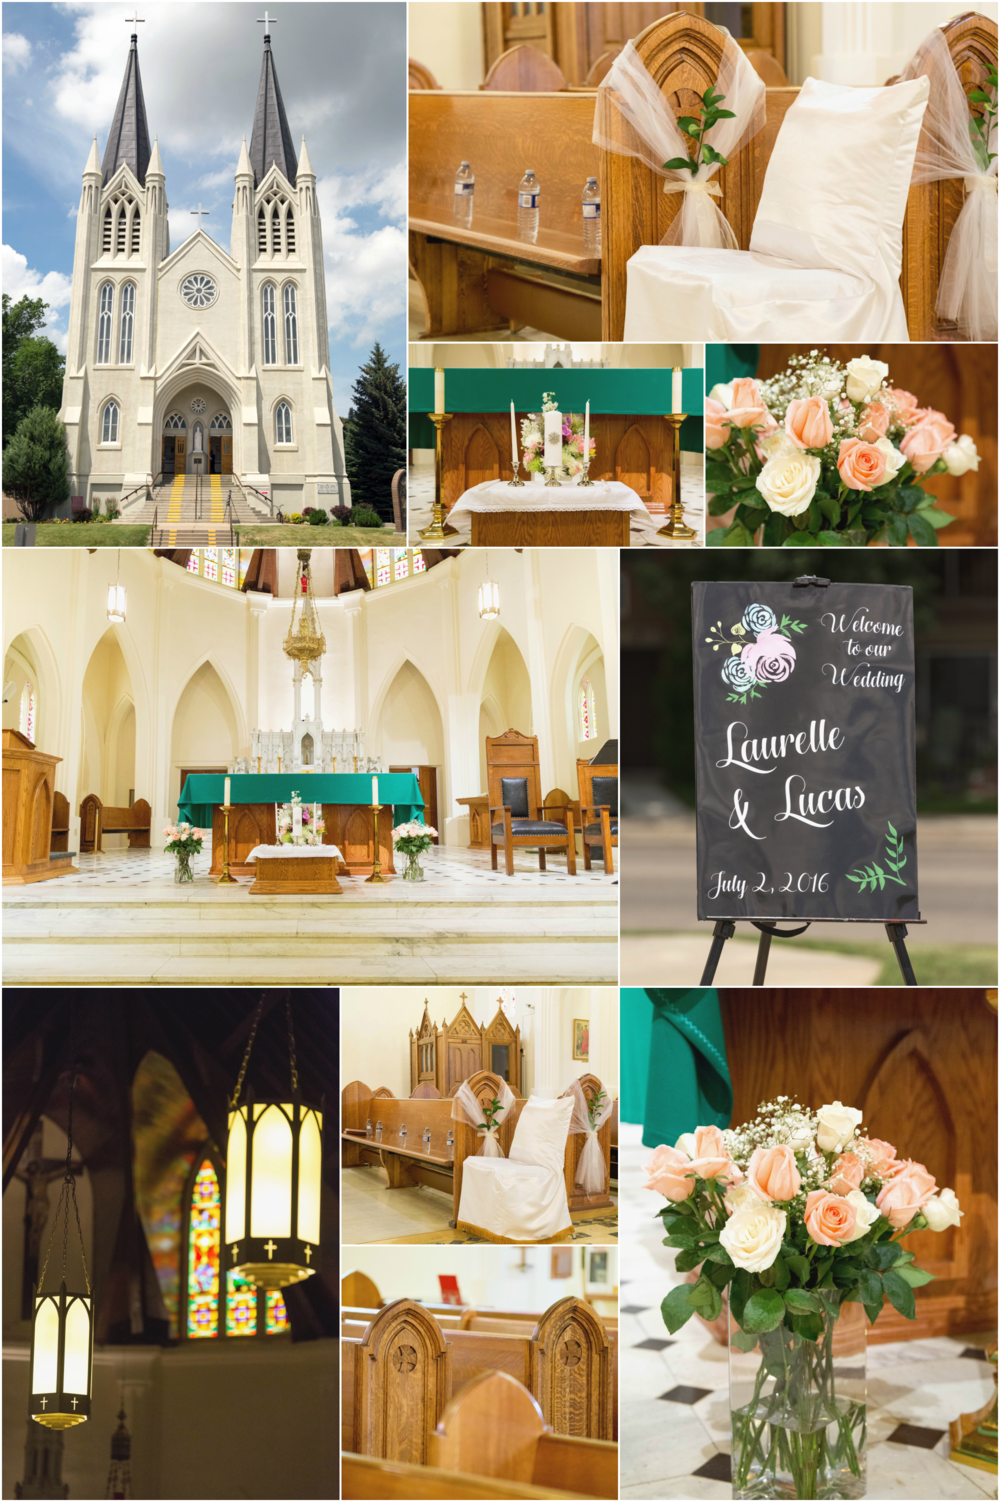 st_patricks_church_wedding_01.png